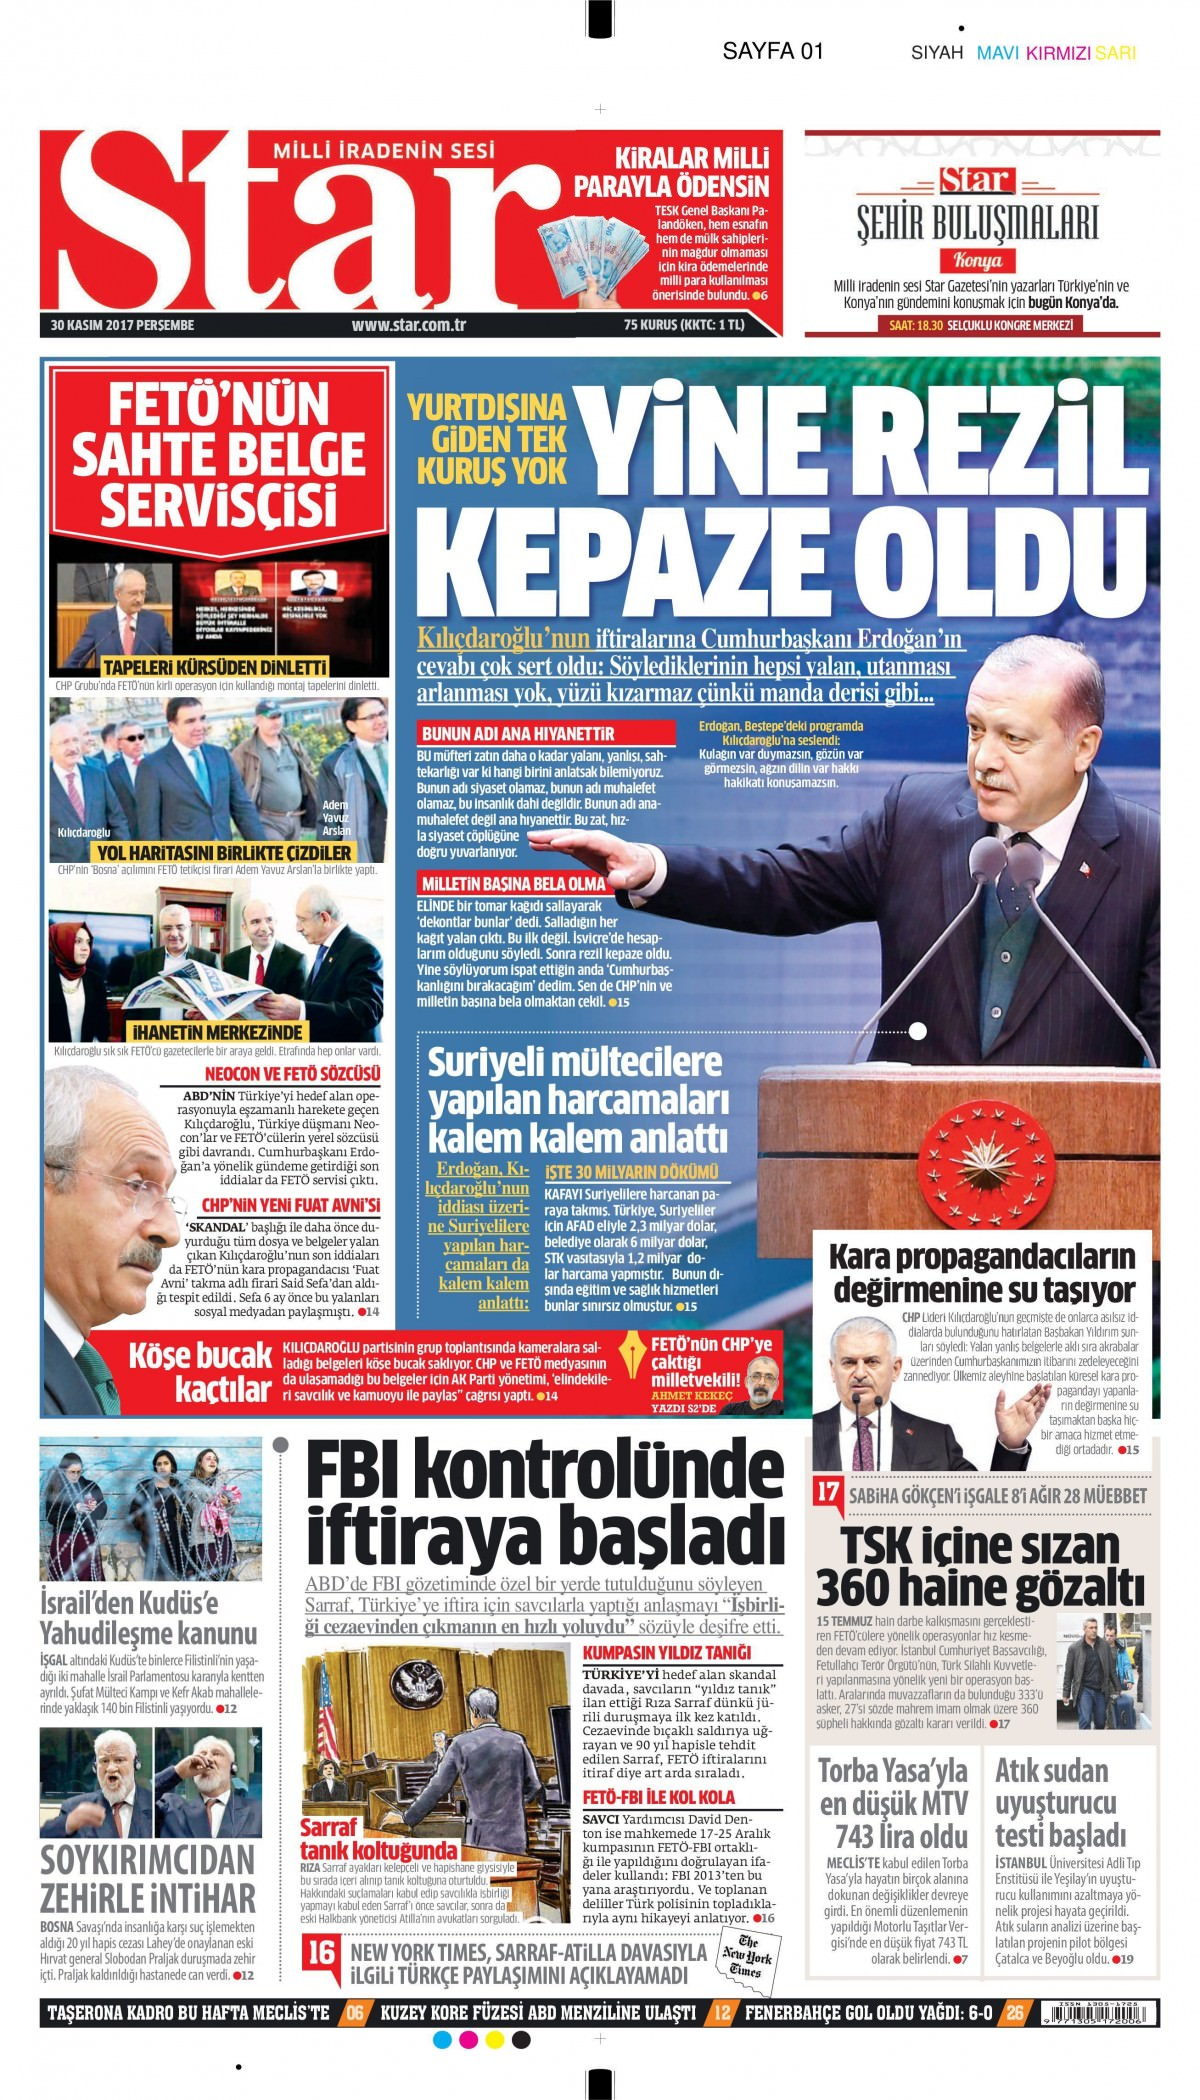 Gazeteler bugün hangi manşeti attı 20